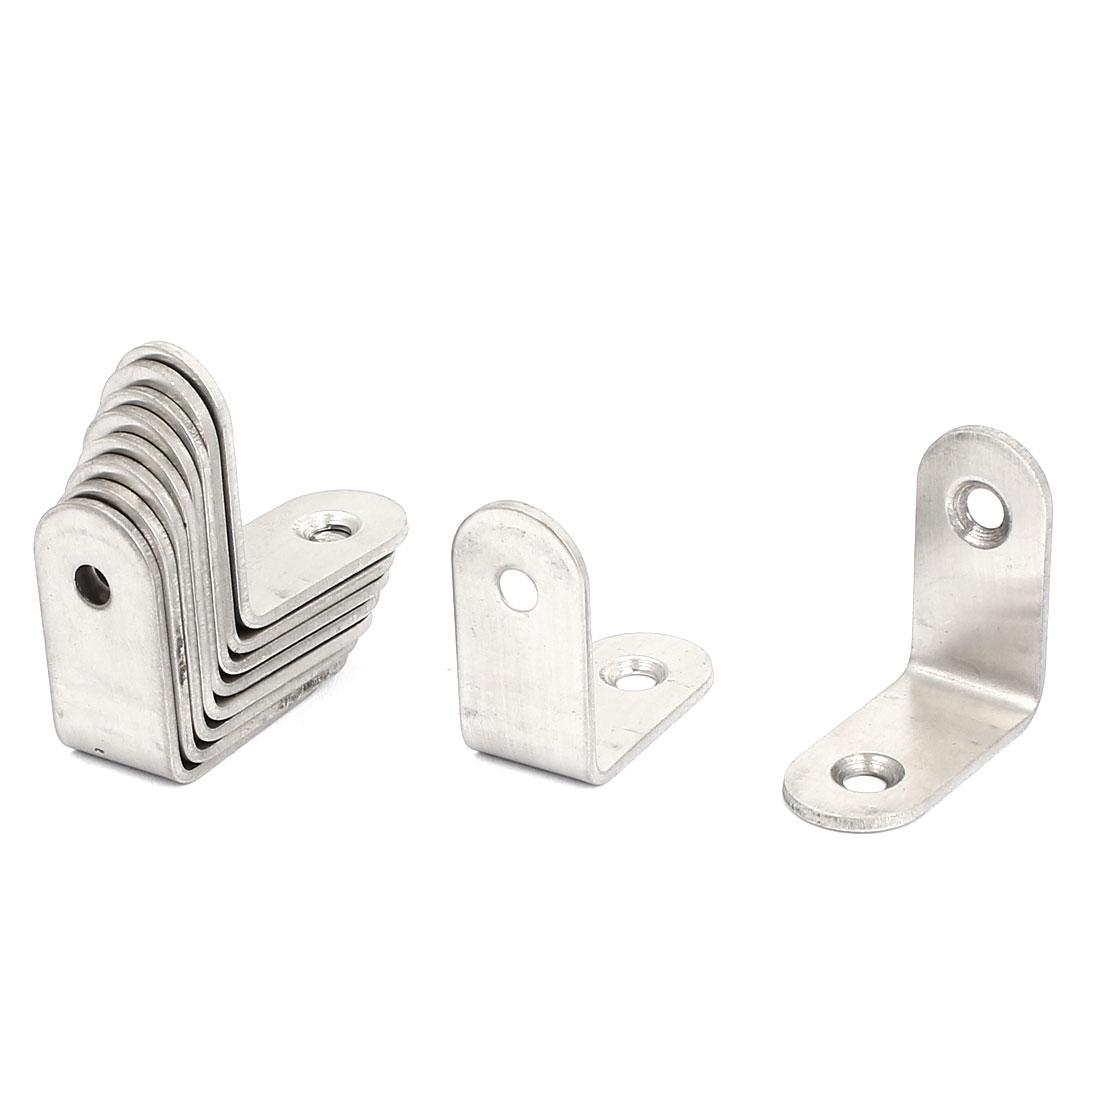 Furniture L Shape Shelf Support Corner Brace Joint Metal Right Angle Bracket Fastener 30mm x 16mm x 30mm 10 Pcs